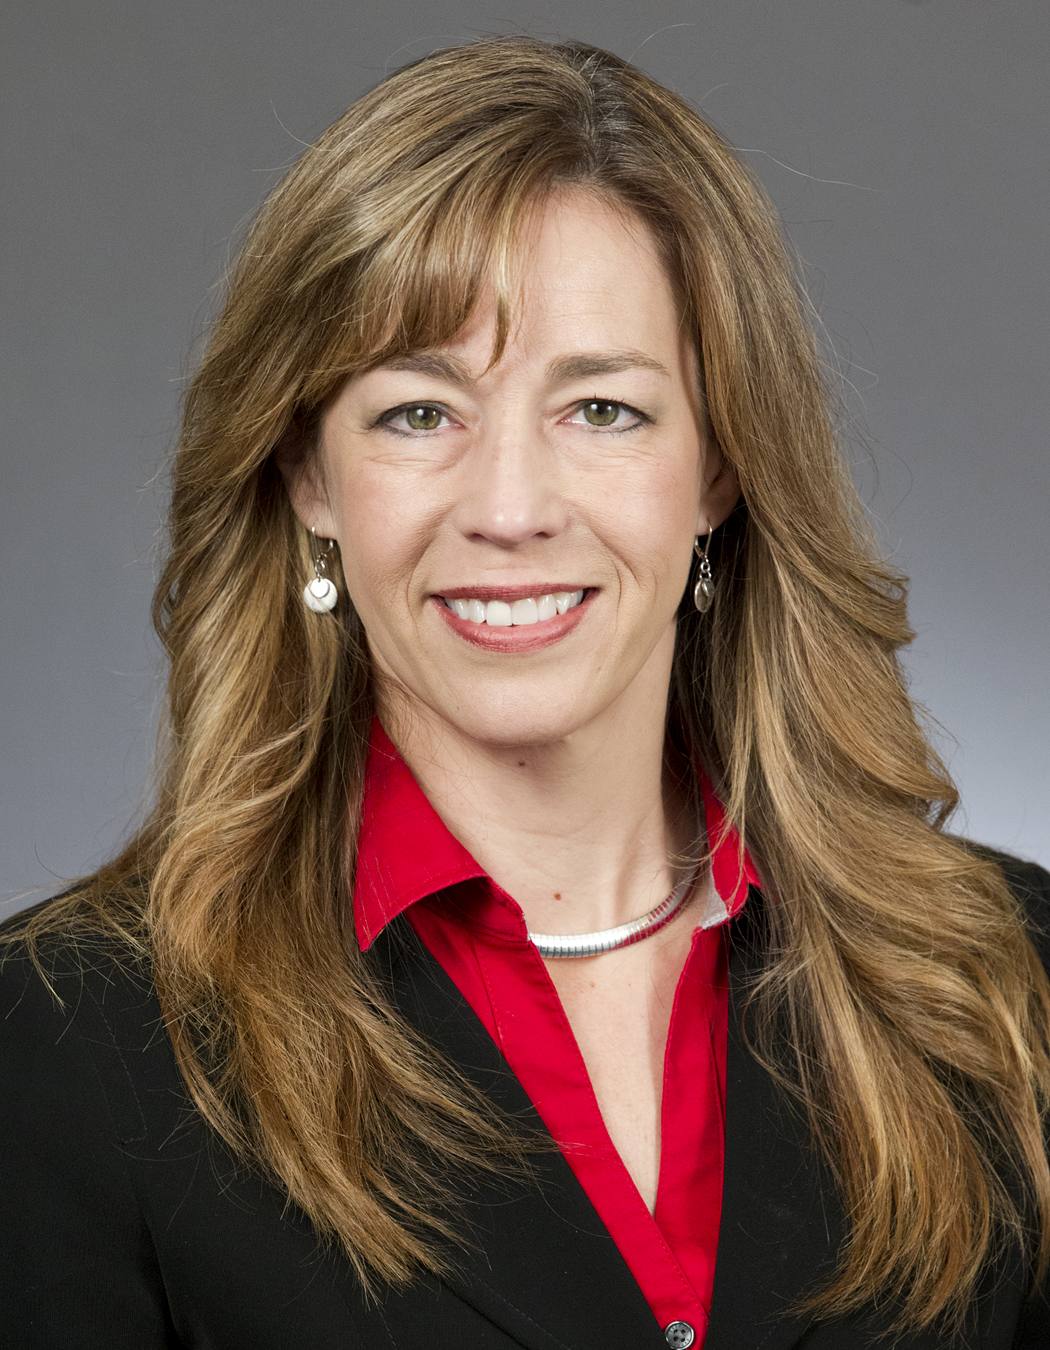 Rep. Roz Peterson